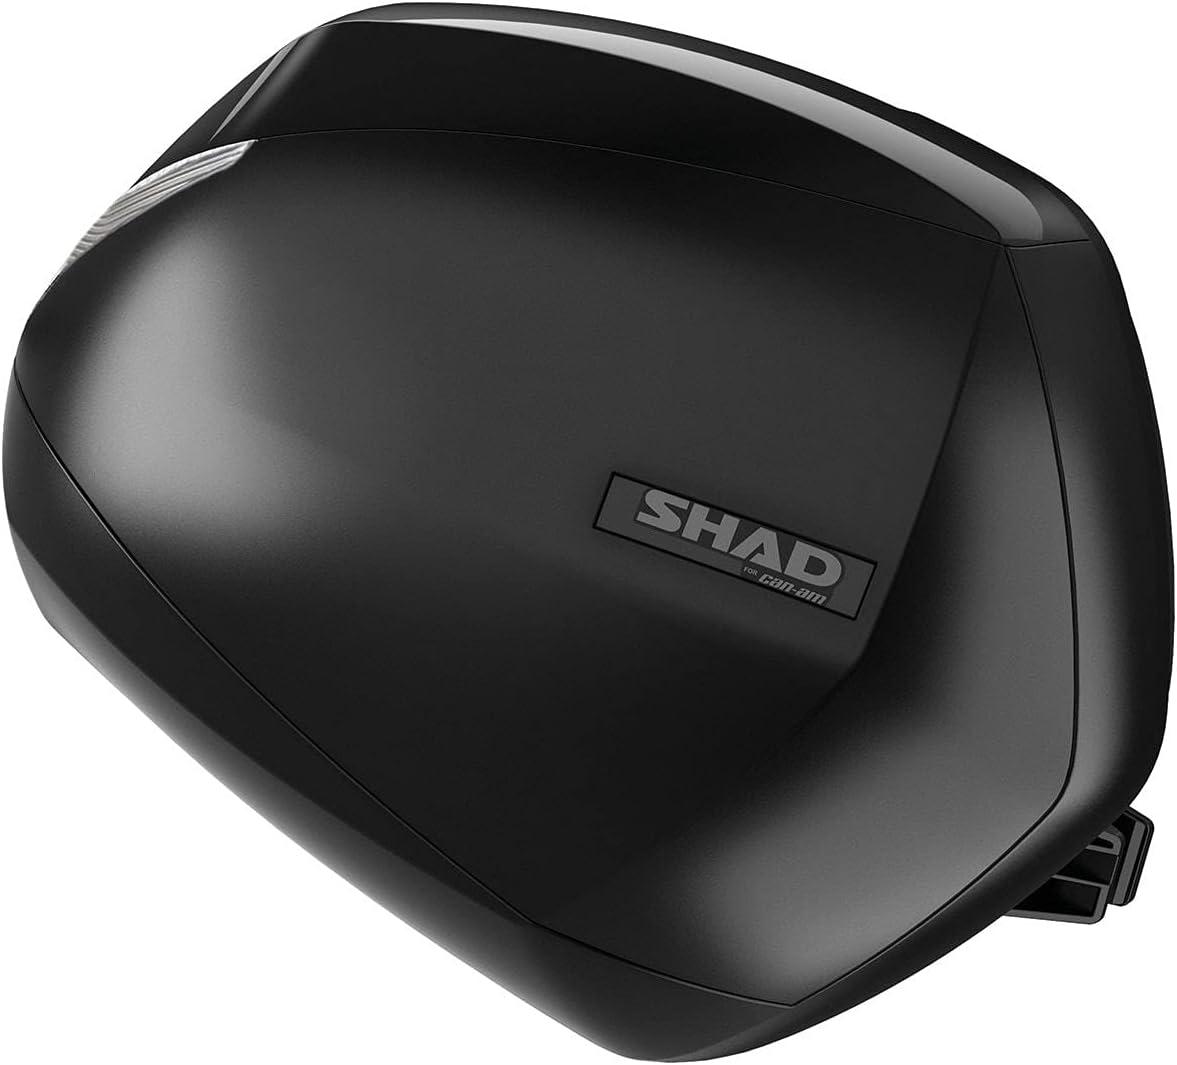 Ryker New OEM Black SHAD B-160 Hard RH Kit Saddlebag 219400844 70% OFF Outlet Direct stock discount